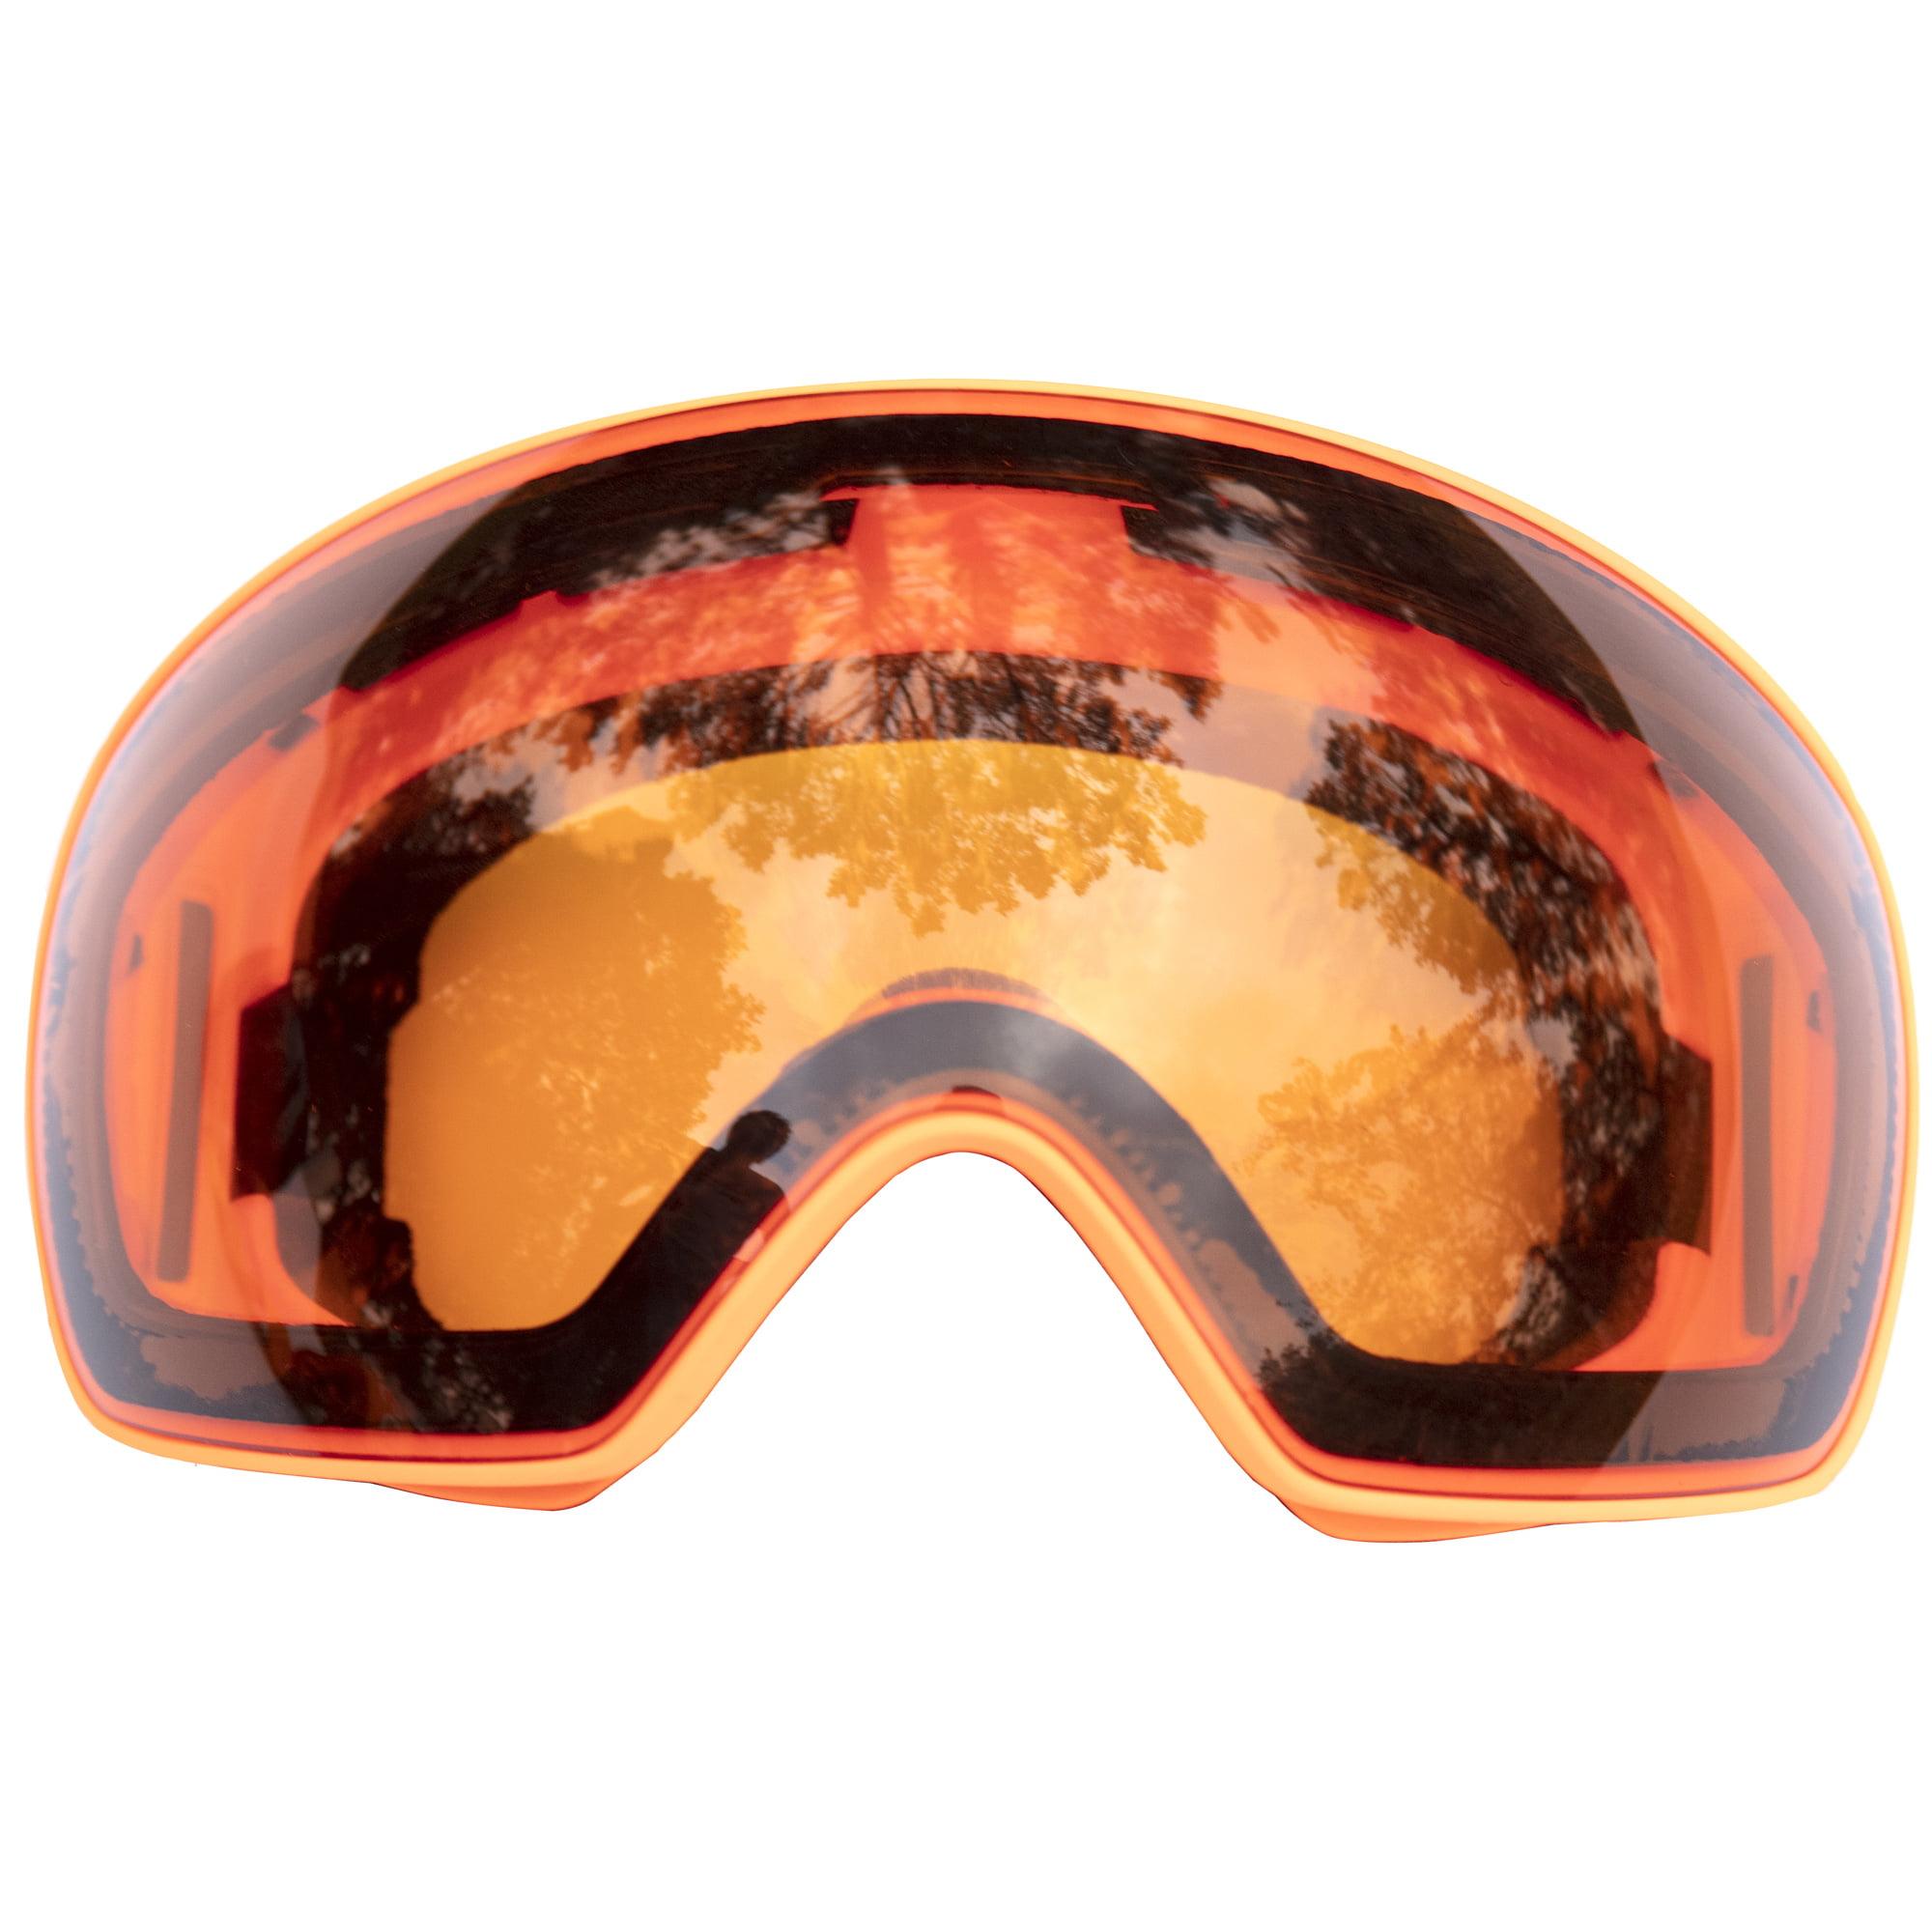 C.F.GOGGLE Professional Ski, Snowboard, and Snowmobile Goggles, Winter Sports Goggle Ski Goggles Over Glasses with Glasses Box For Mens and Womens Red,Blue,Black